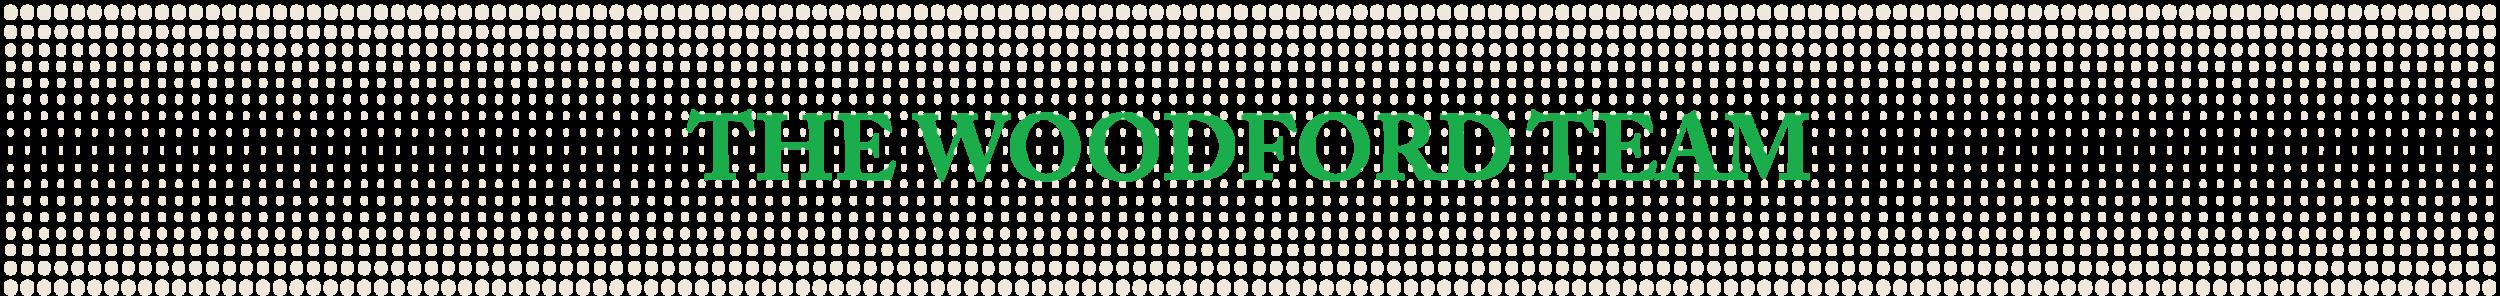 Woodford_TheTeam_v1.png